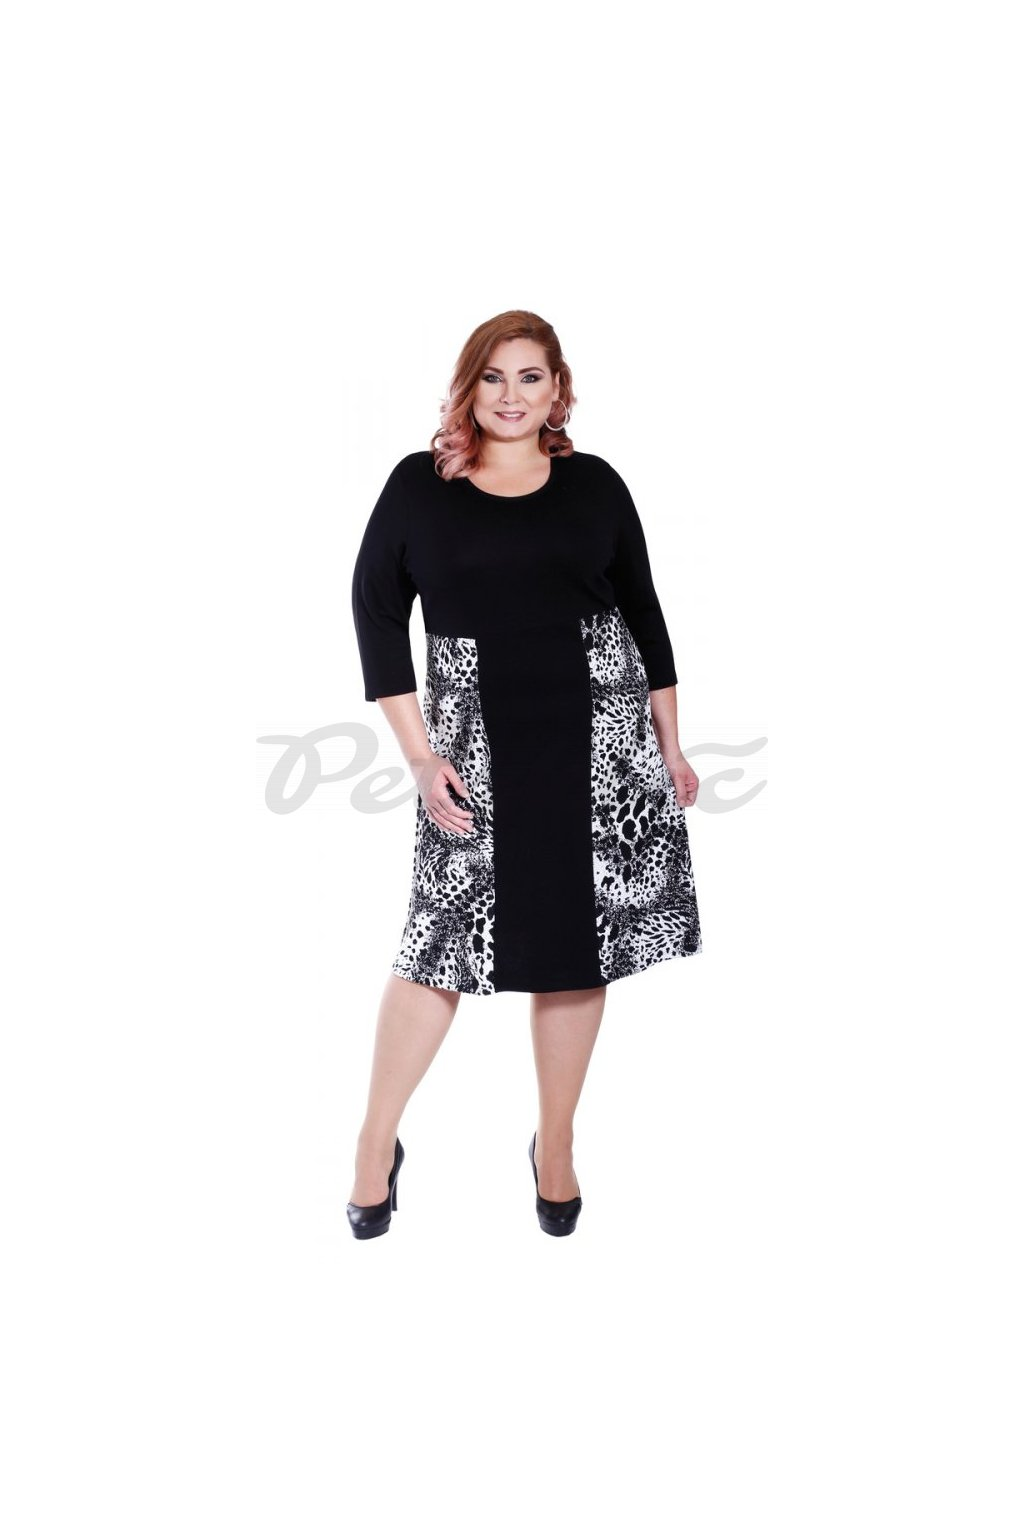 FILA - šaty 90 - 95 cm